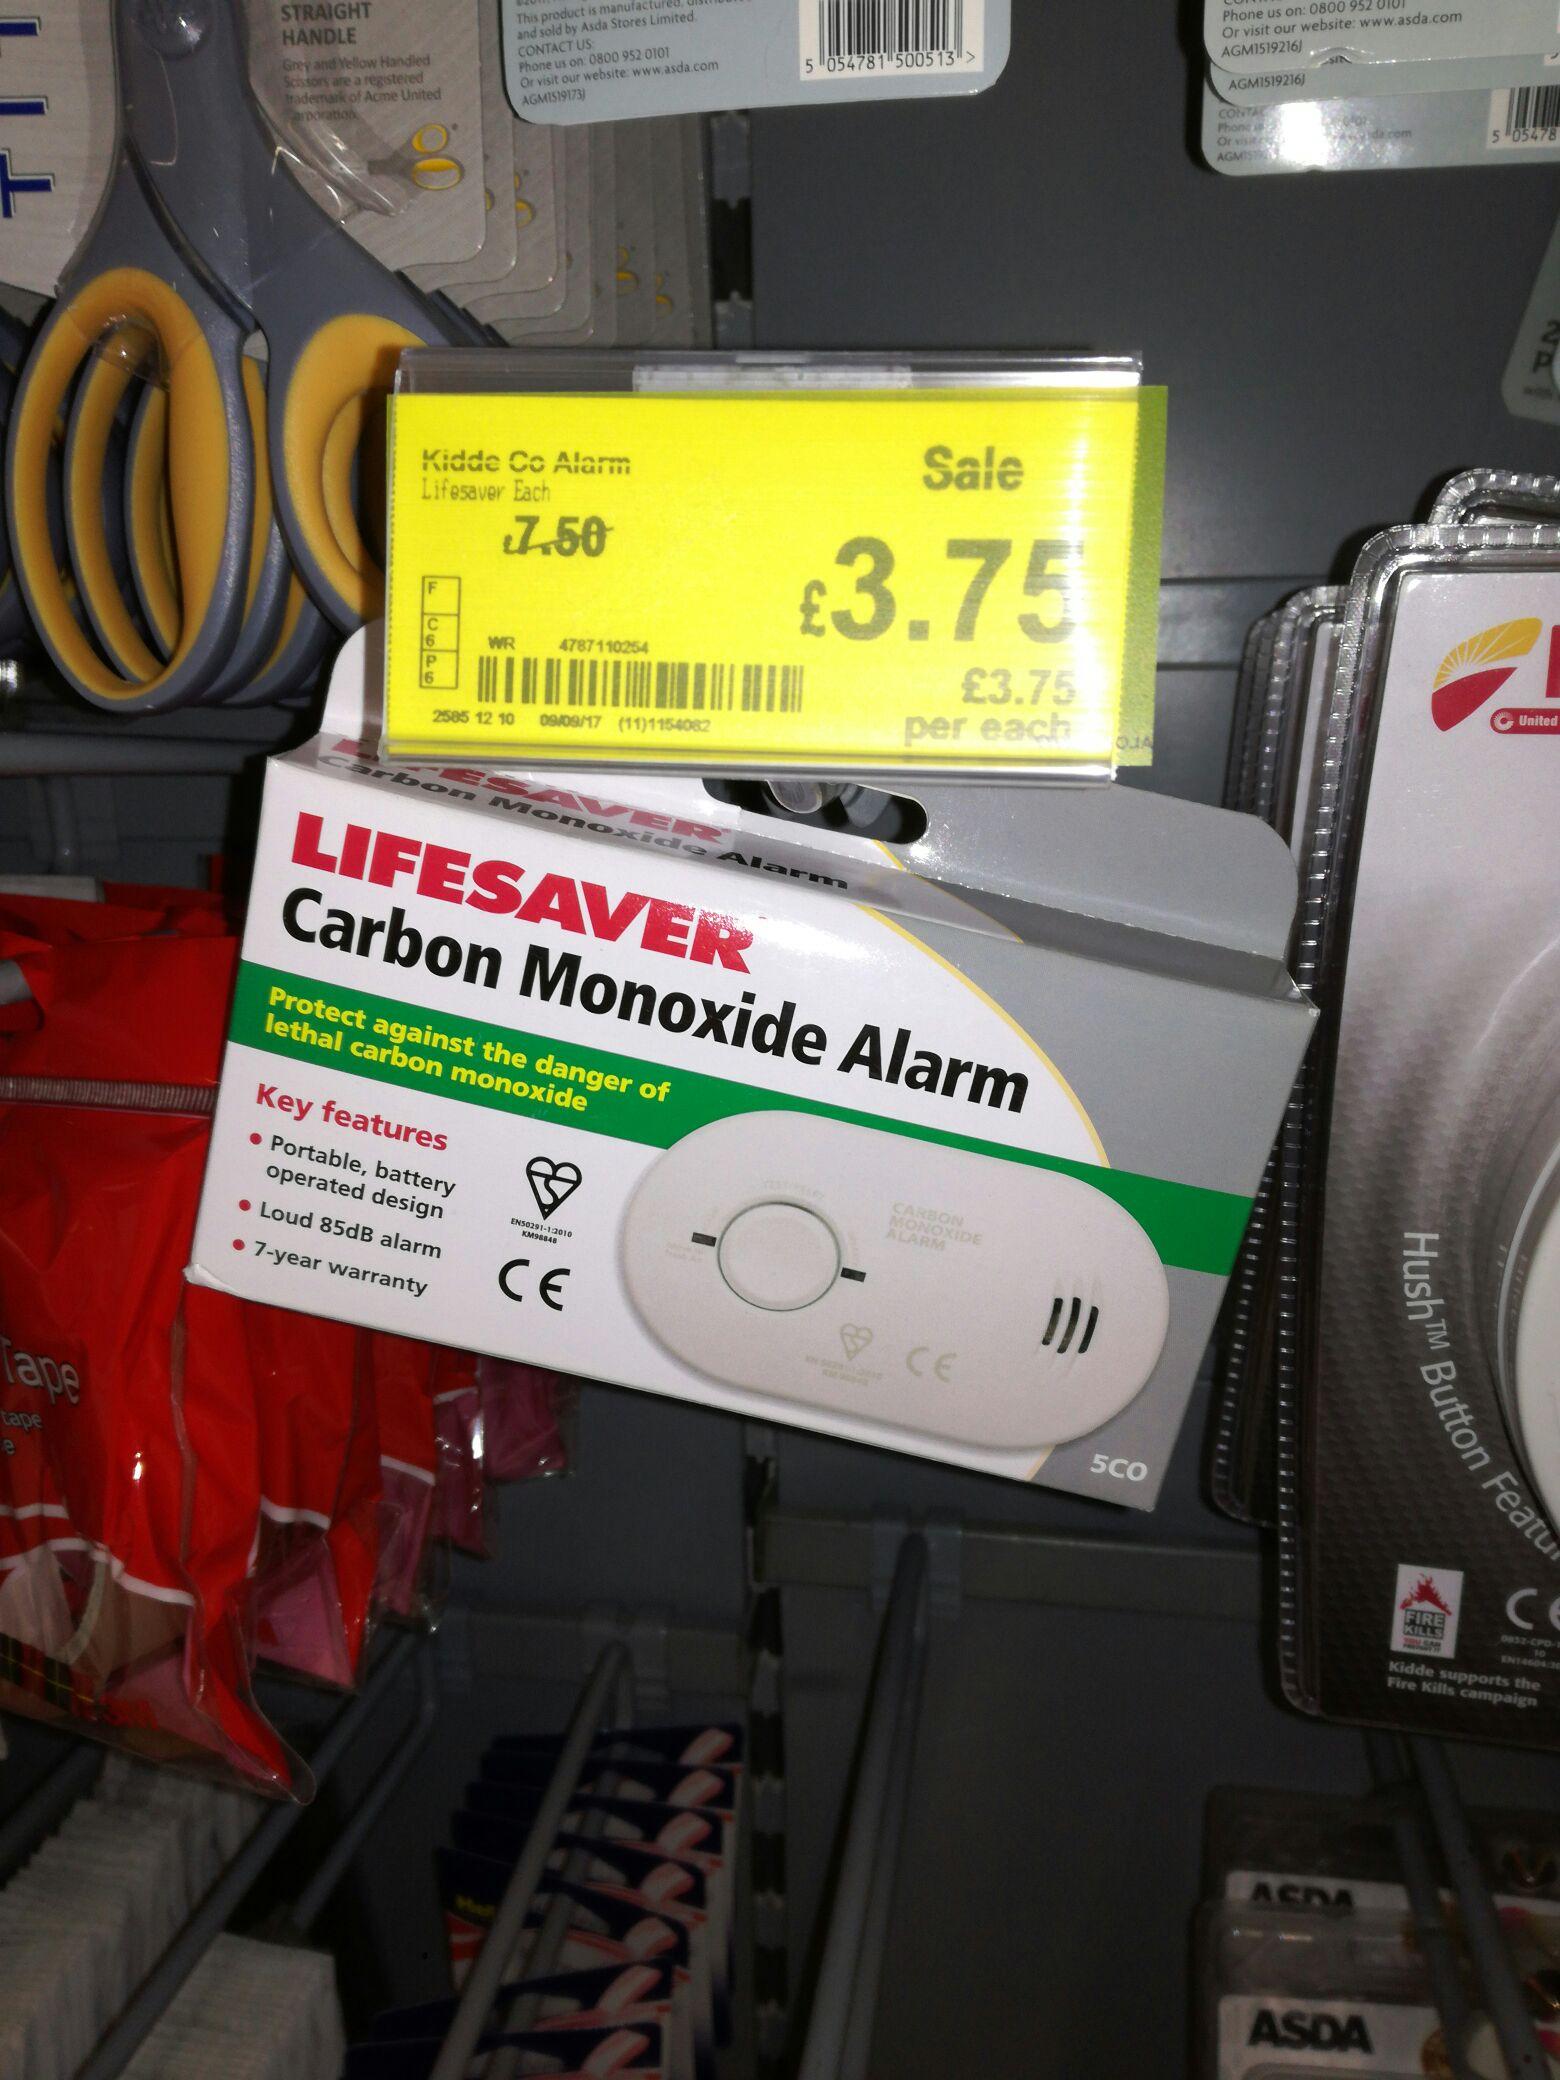 Kidde Carbon Monoxide Alarm half price £3.75 in Asda.  5 year smoke alarms also reduced to £6.00